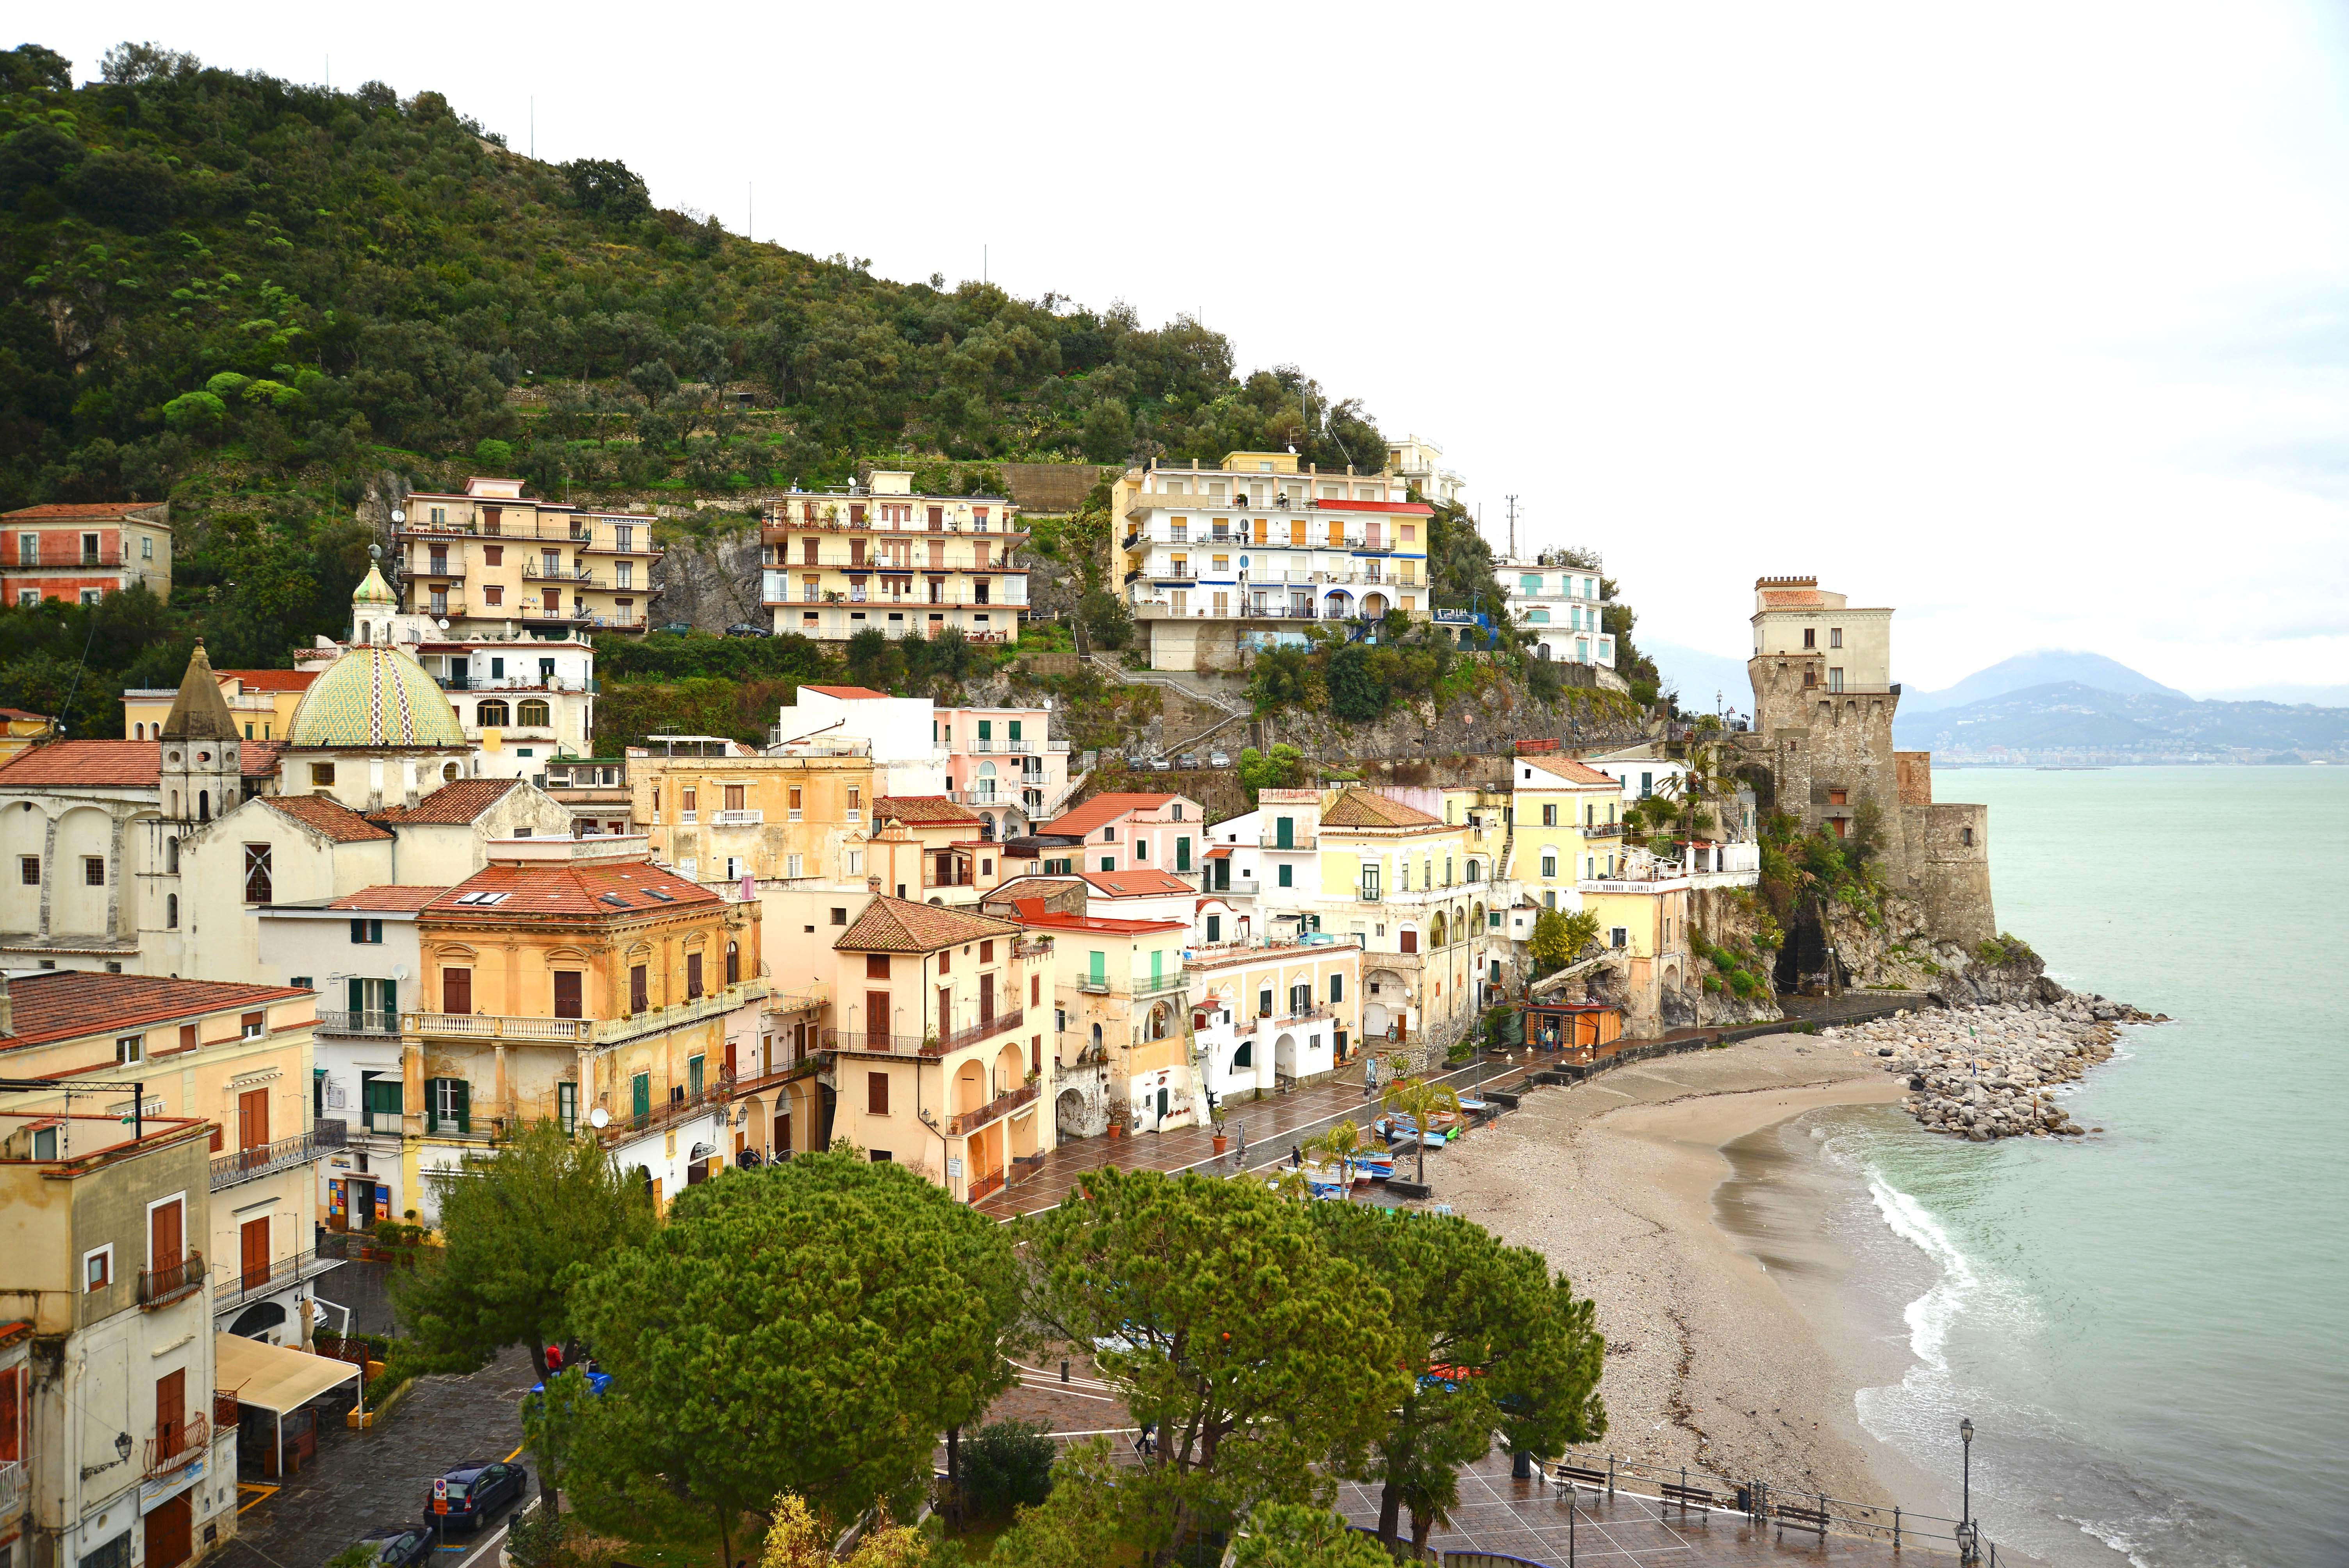 Ravello, Amalfi, Positano, and the Amalfi Coast | John Triggiani